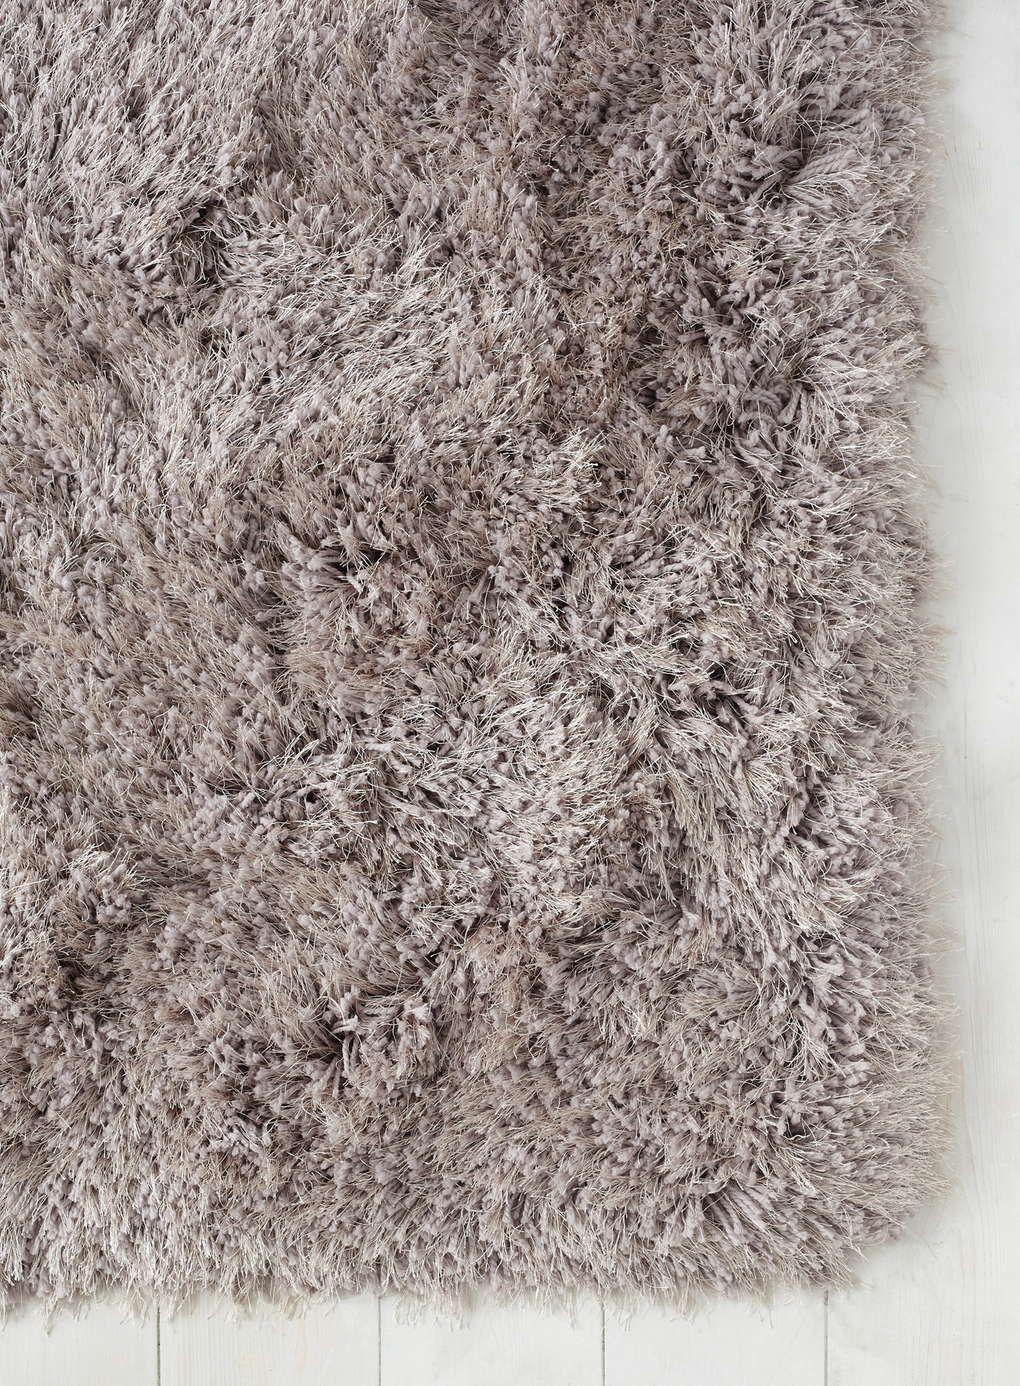 Capri Shaggy Shimmer Rug 100x150 Blush